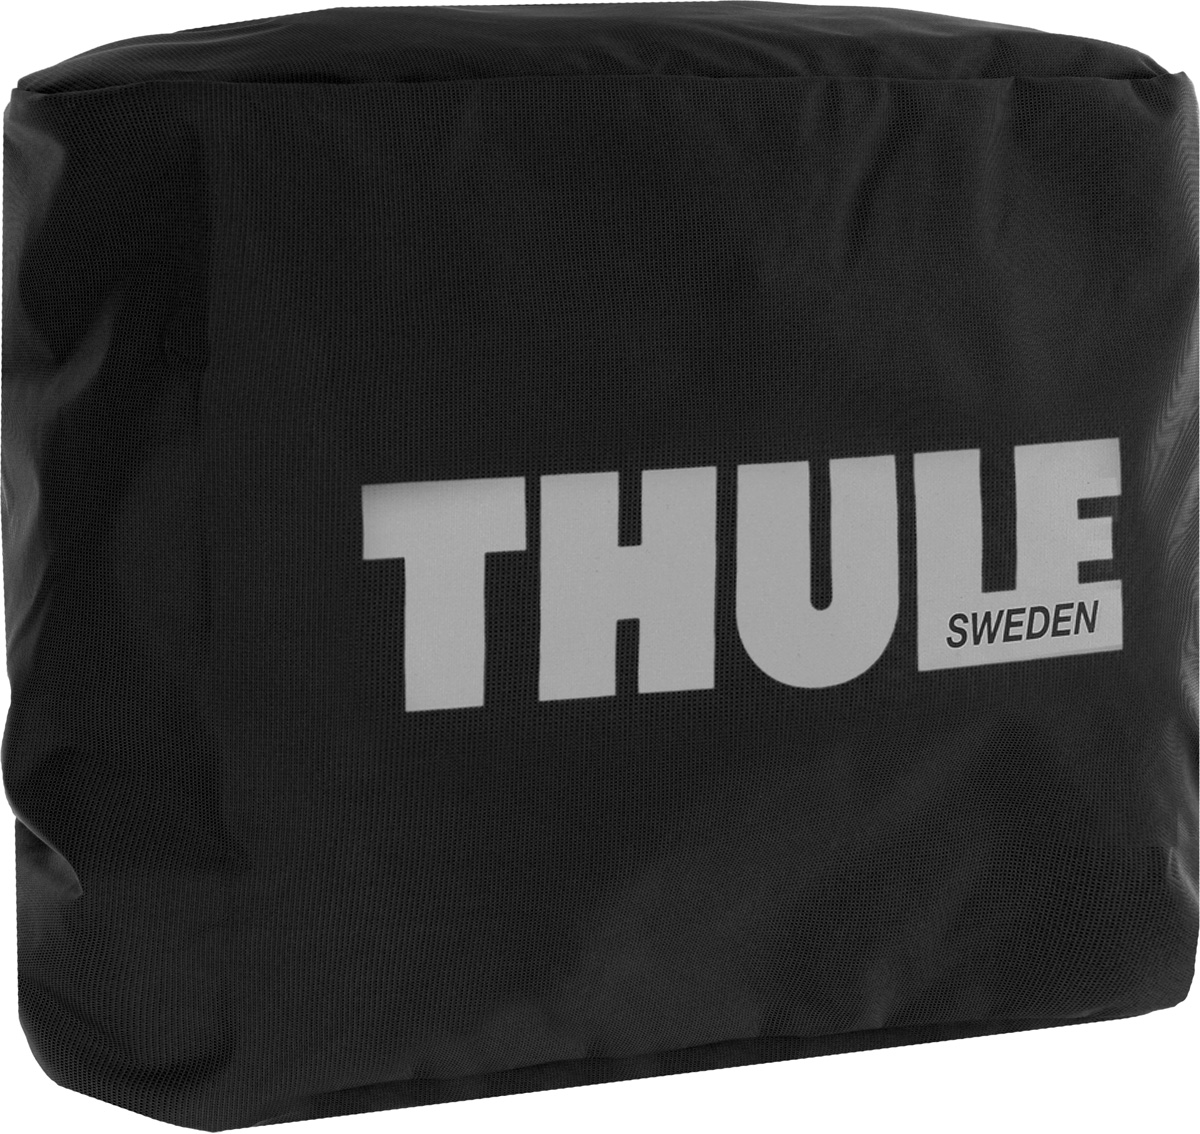 Чехол-дождевик для сумки Thule Pannier, 34 х 24 х 19 см чемоданы thule дорожная сумка на колесах thule crossover